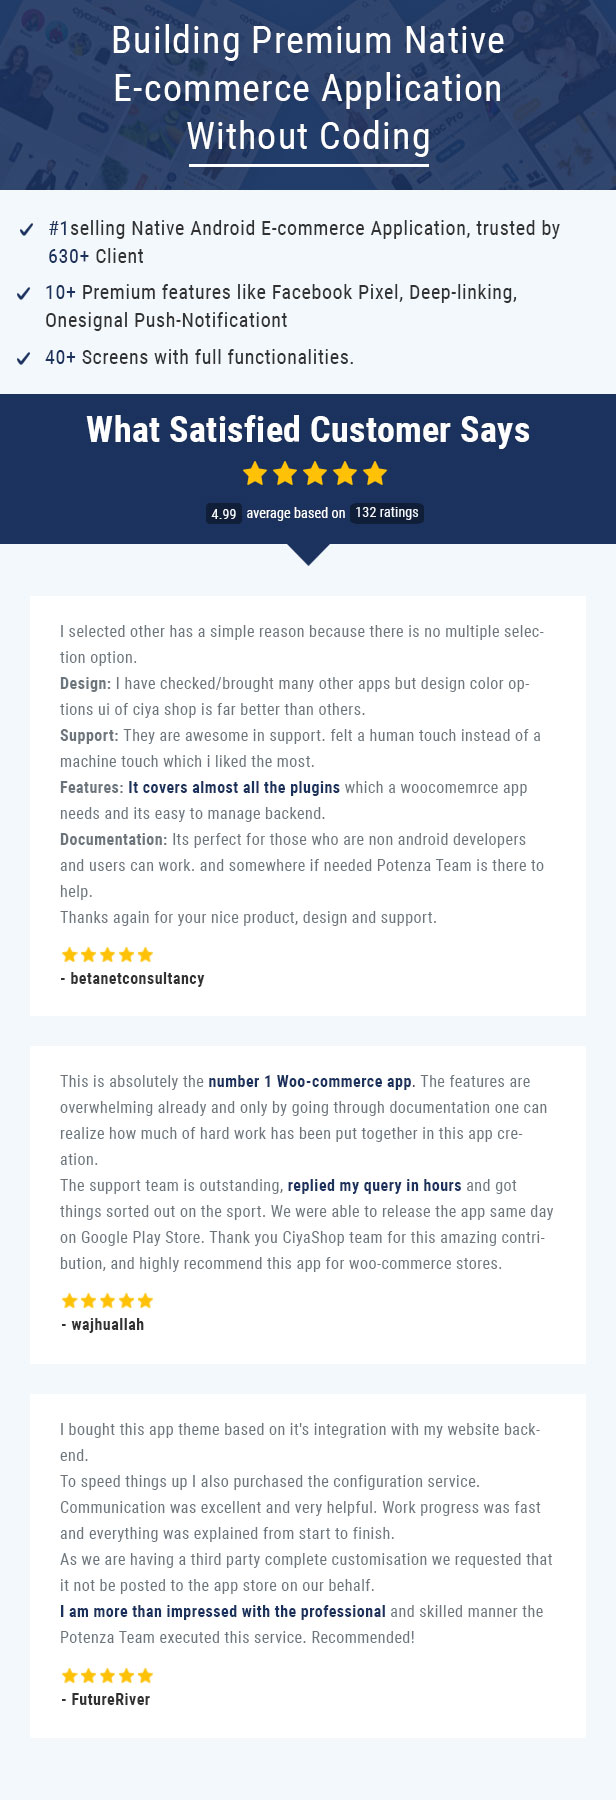 CiyaShop Native Android Application based on WooCommerce - 8